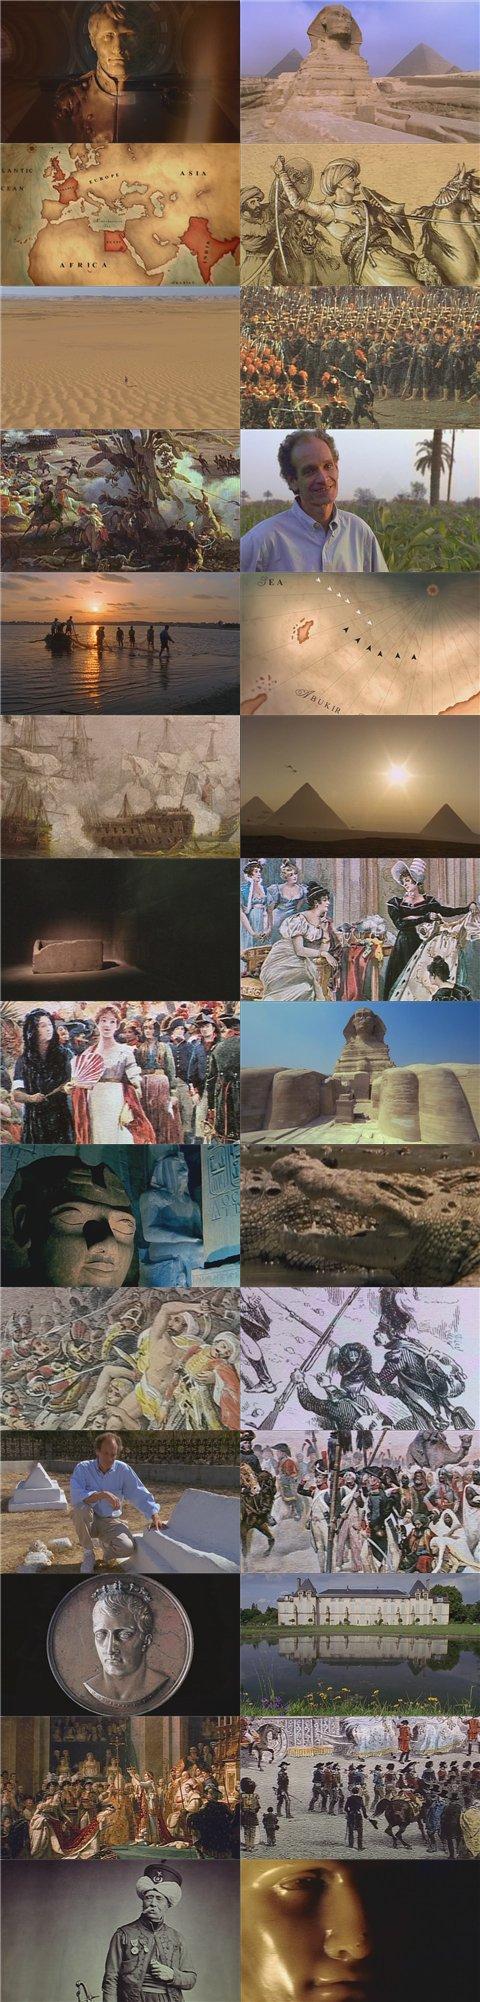 DSC Napoleon's Obsession: The Quest for Egypt DivX AC3 dual audio ( preview 1